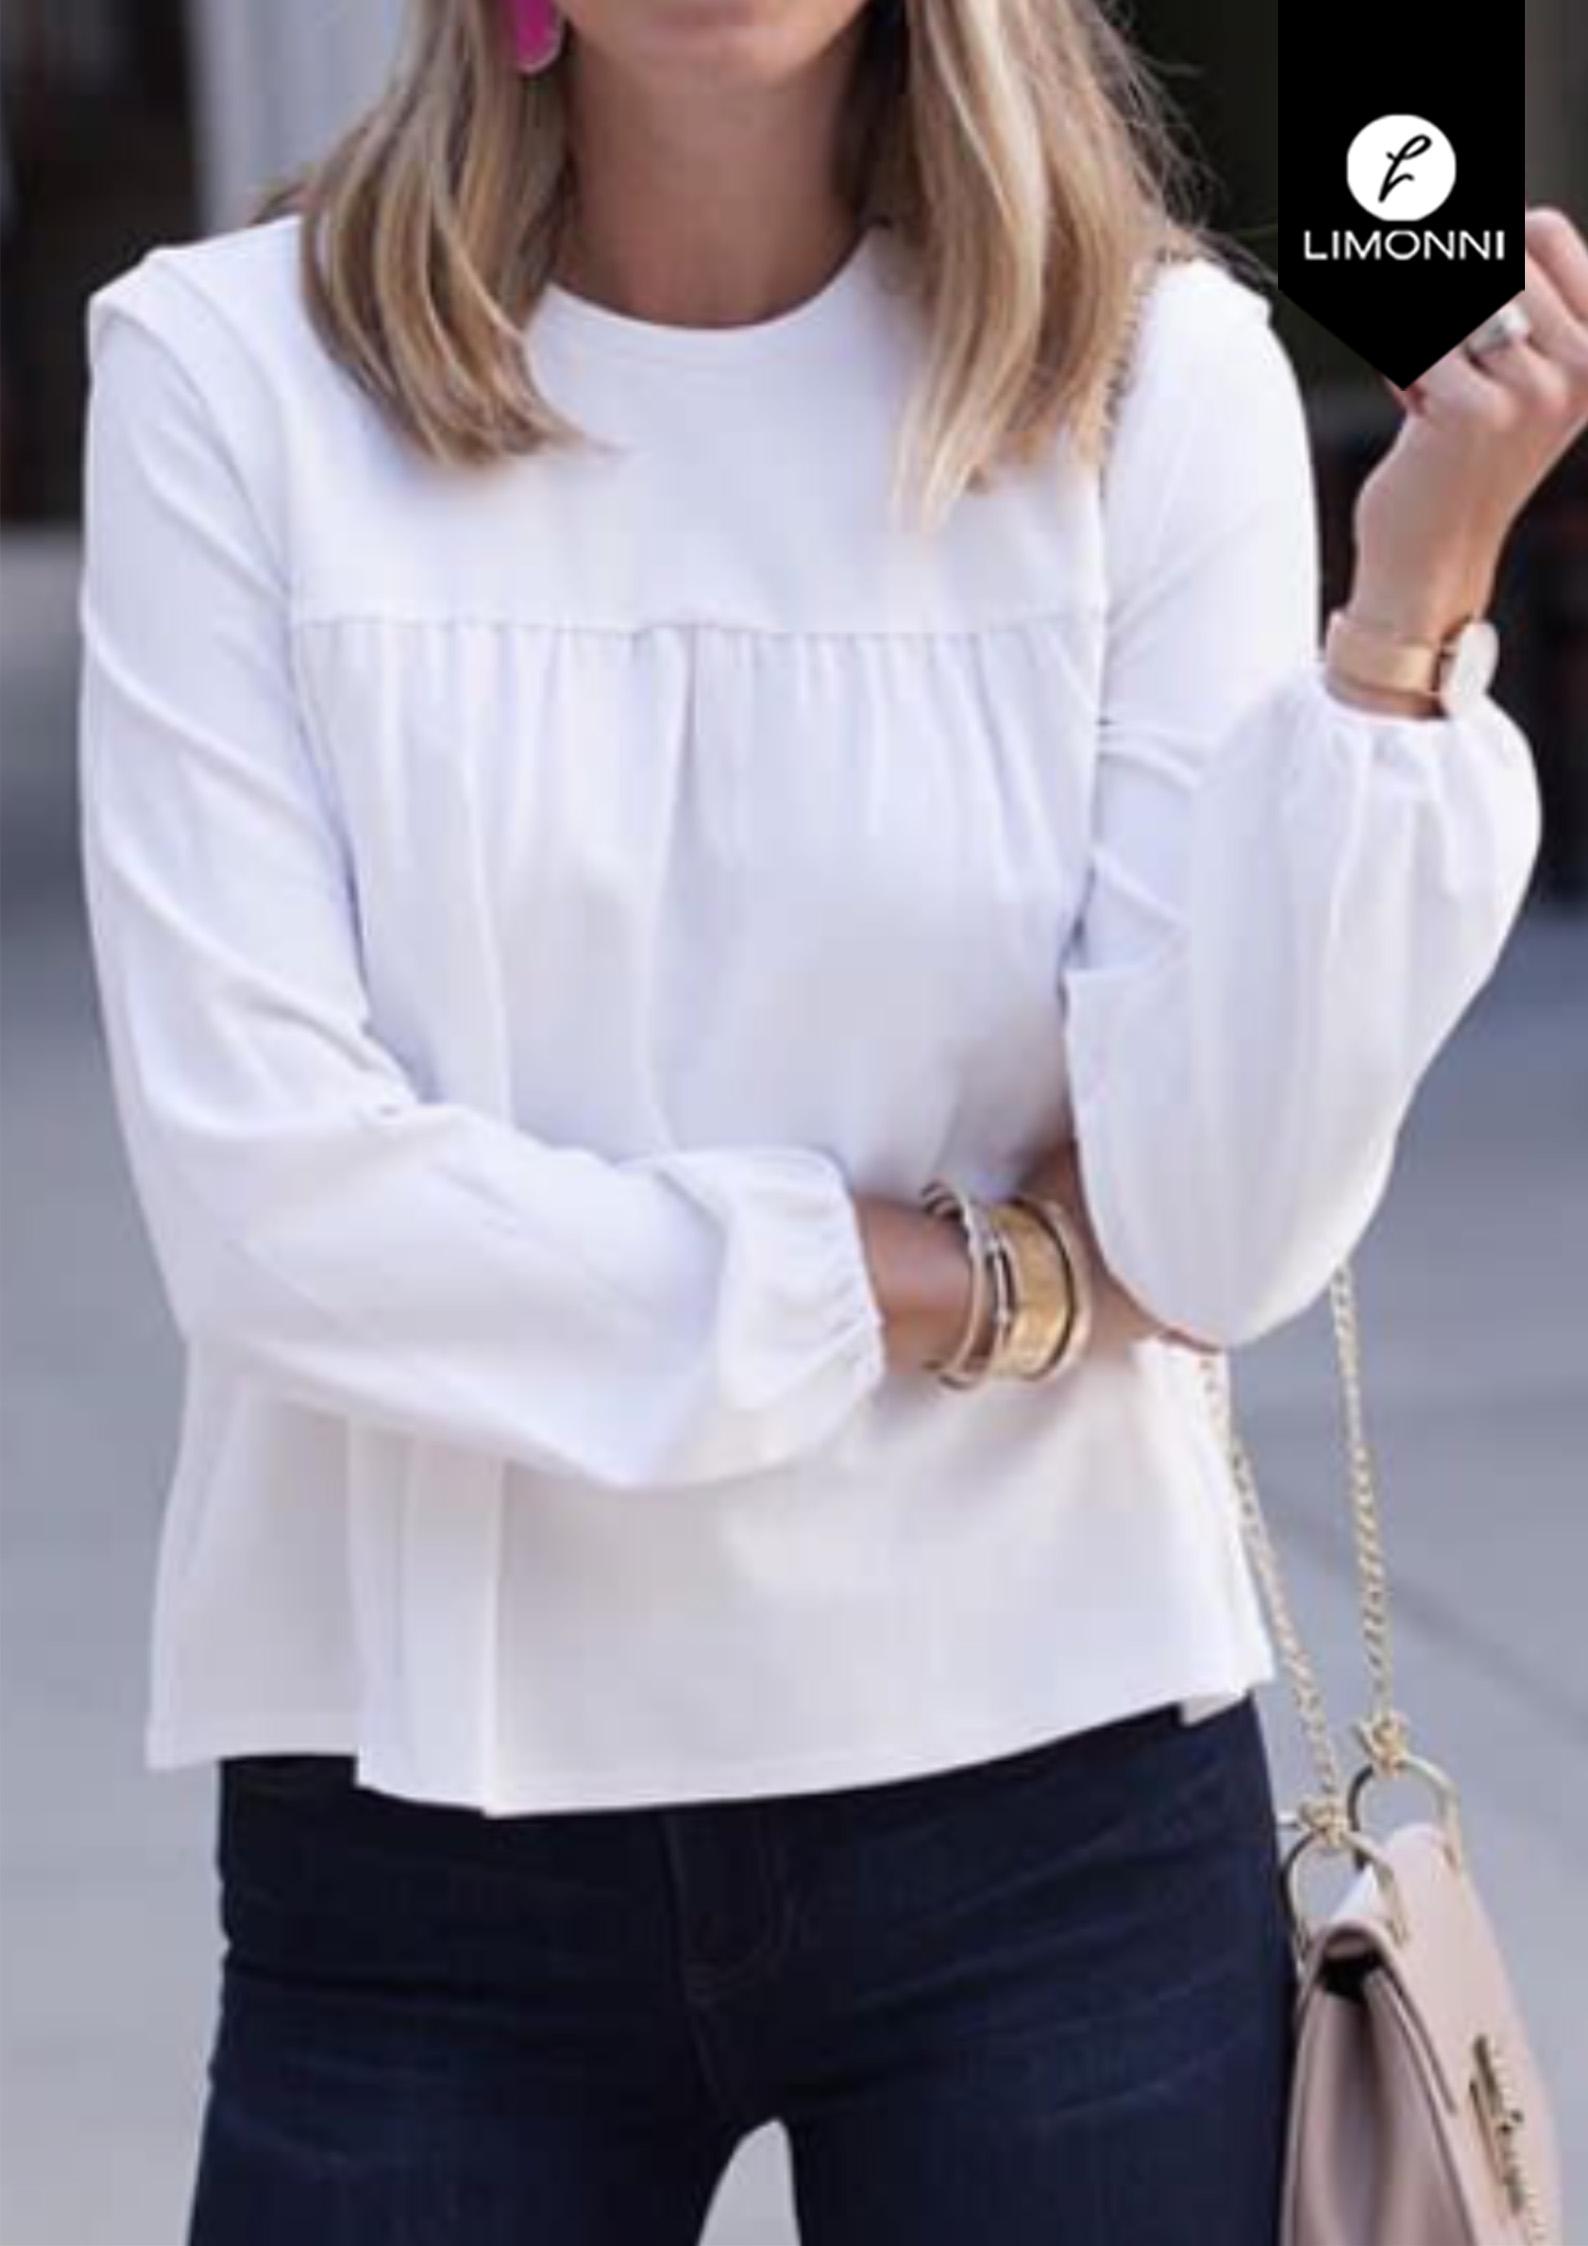 Blusas para mujer Limonni Bennett LI1369 Campesinas